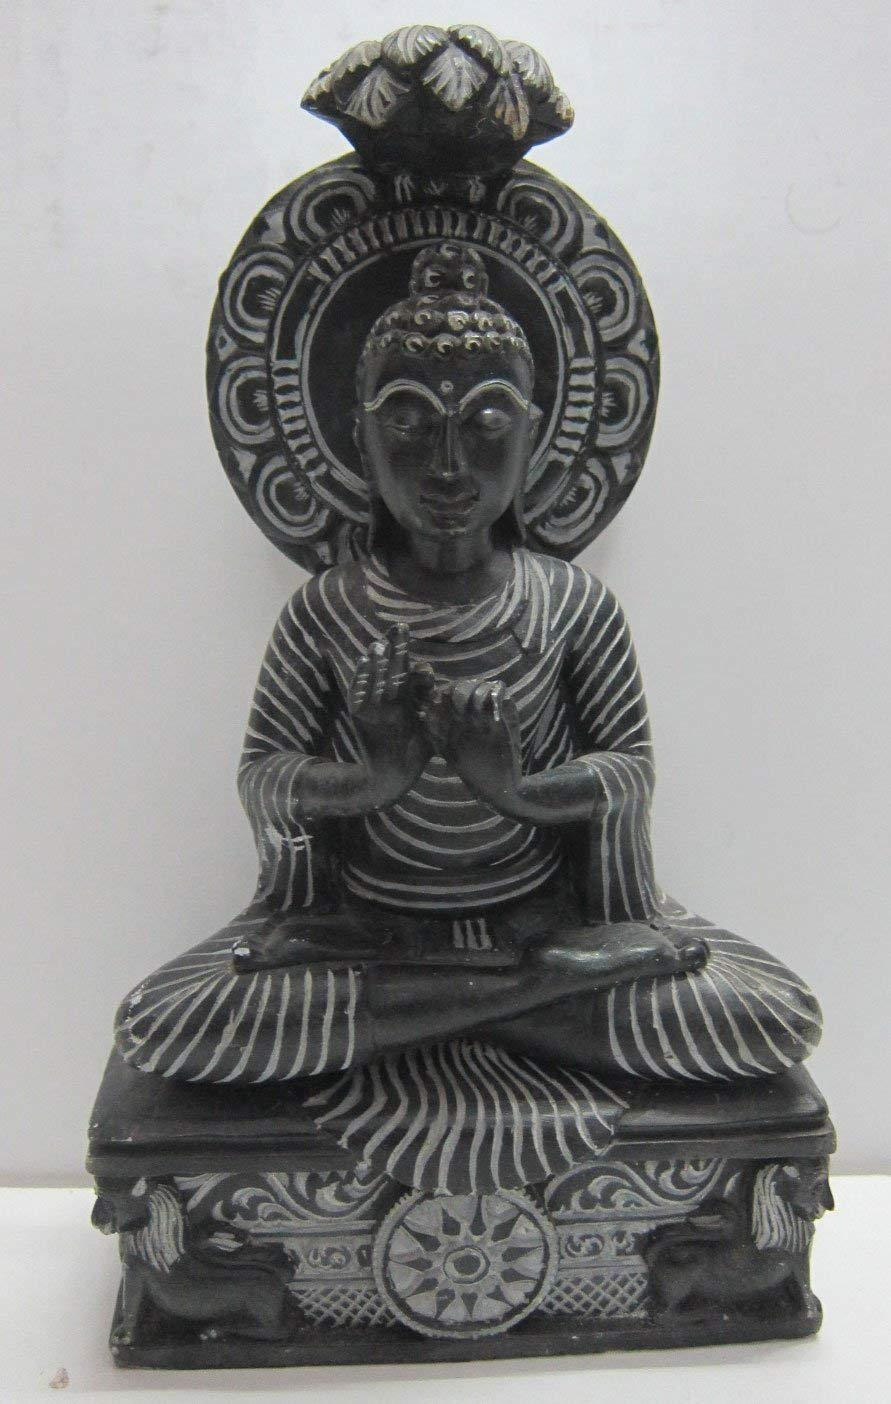 Odishabazaar Lord Buddha Stone Statue in Dharmachakra Mudra 8 Inch